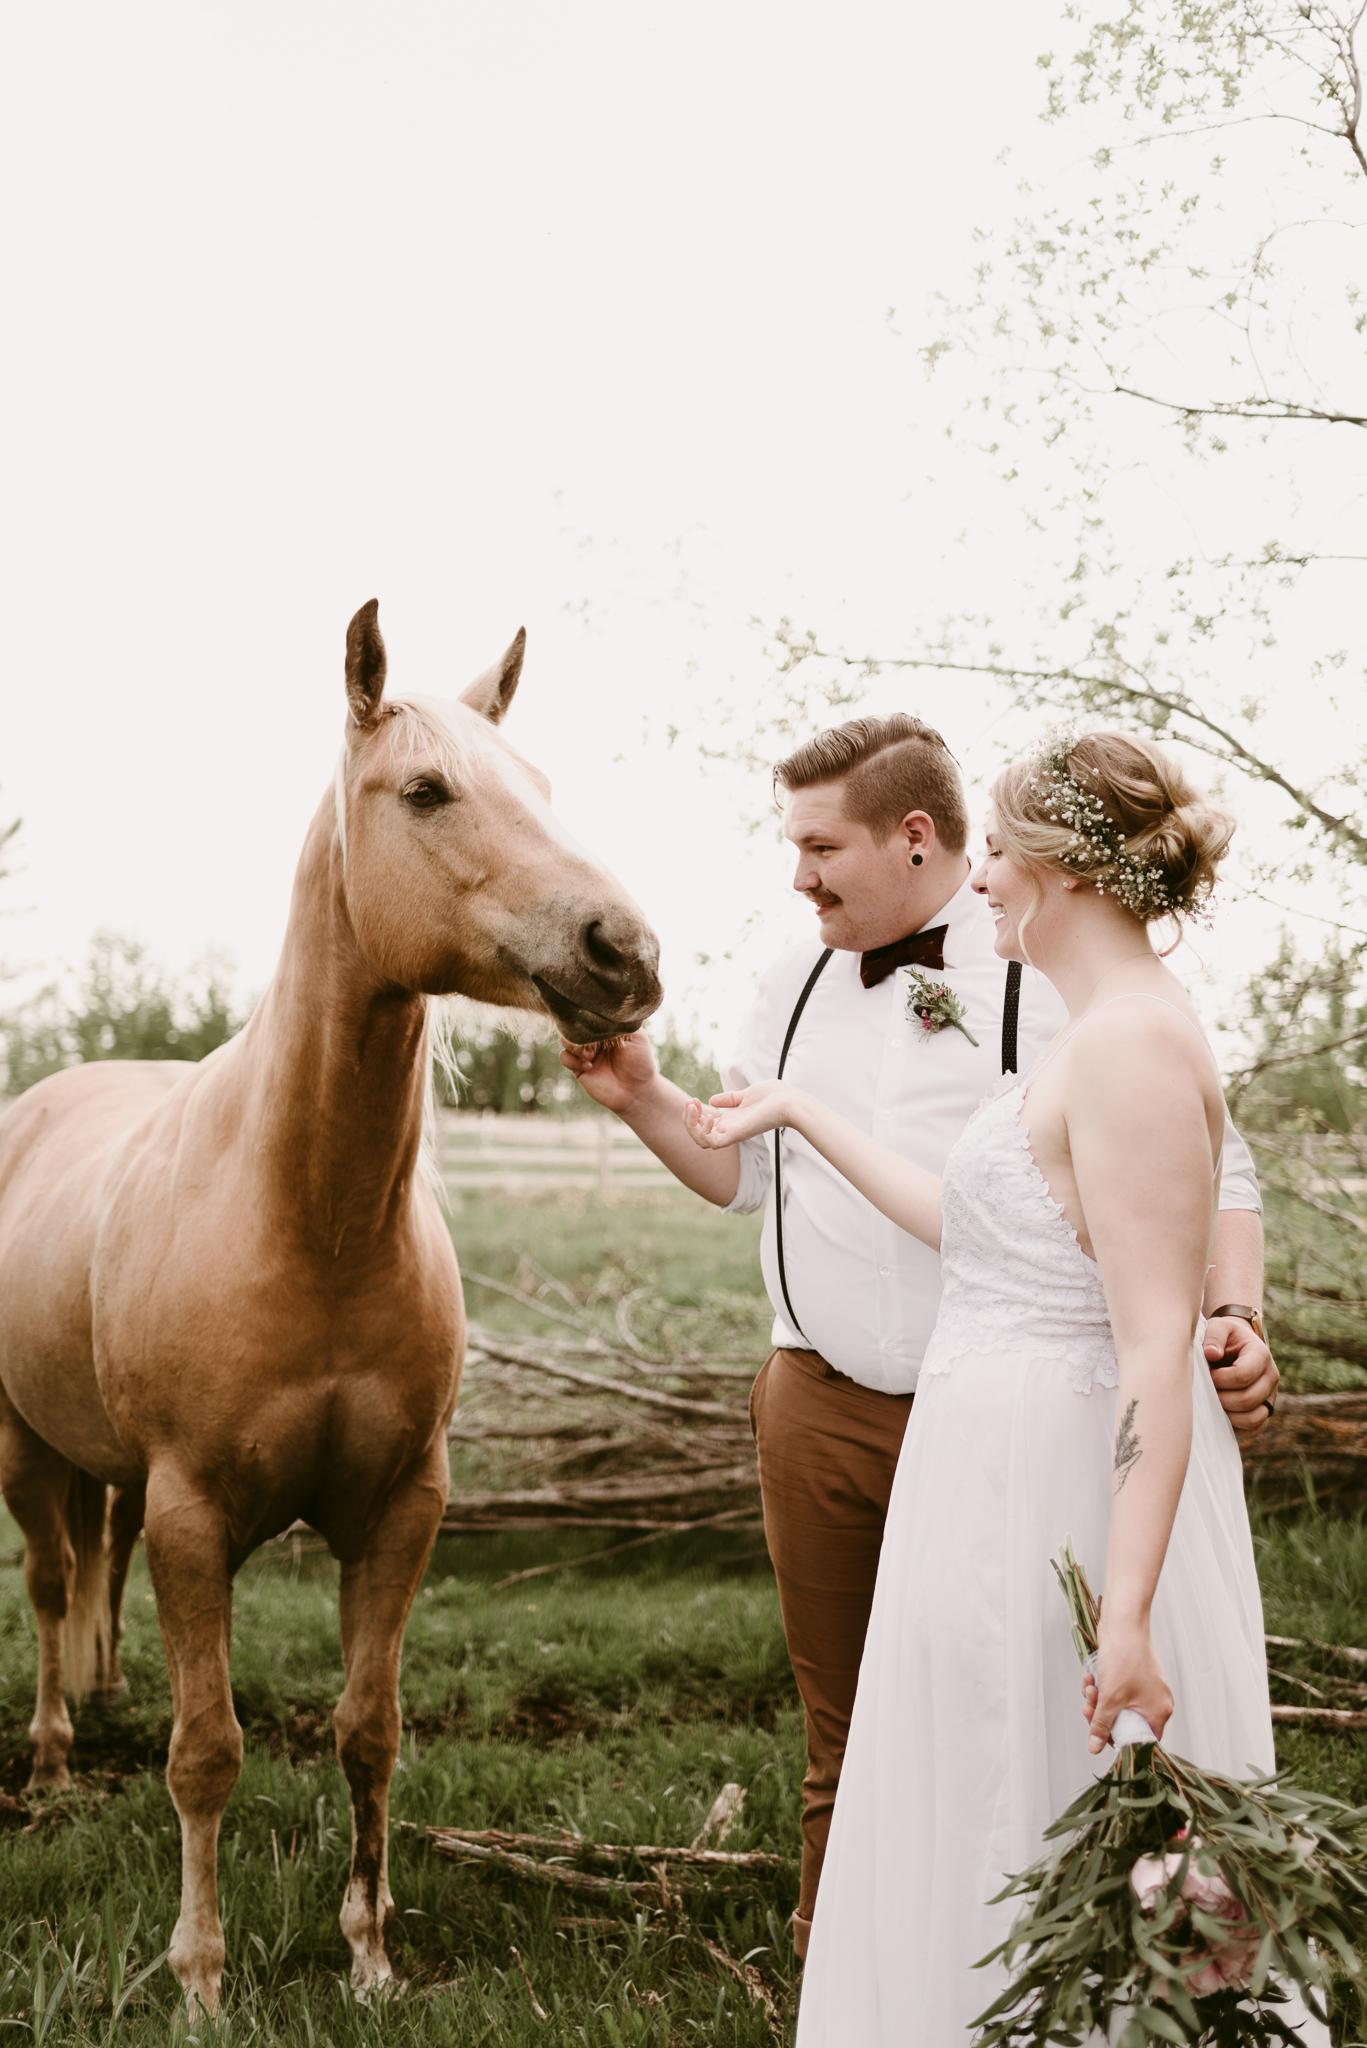 D&P-weddingblog-101.jpg